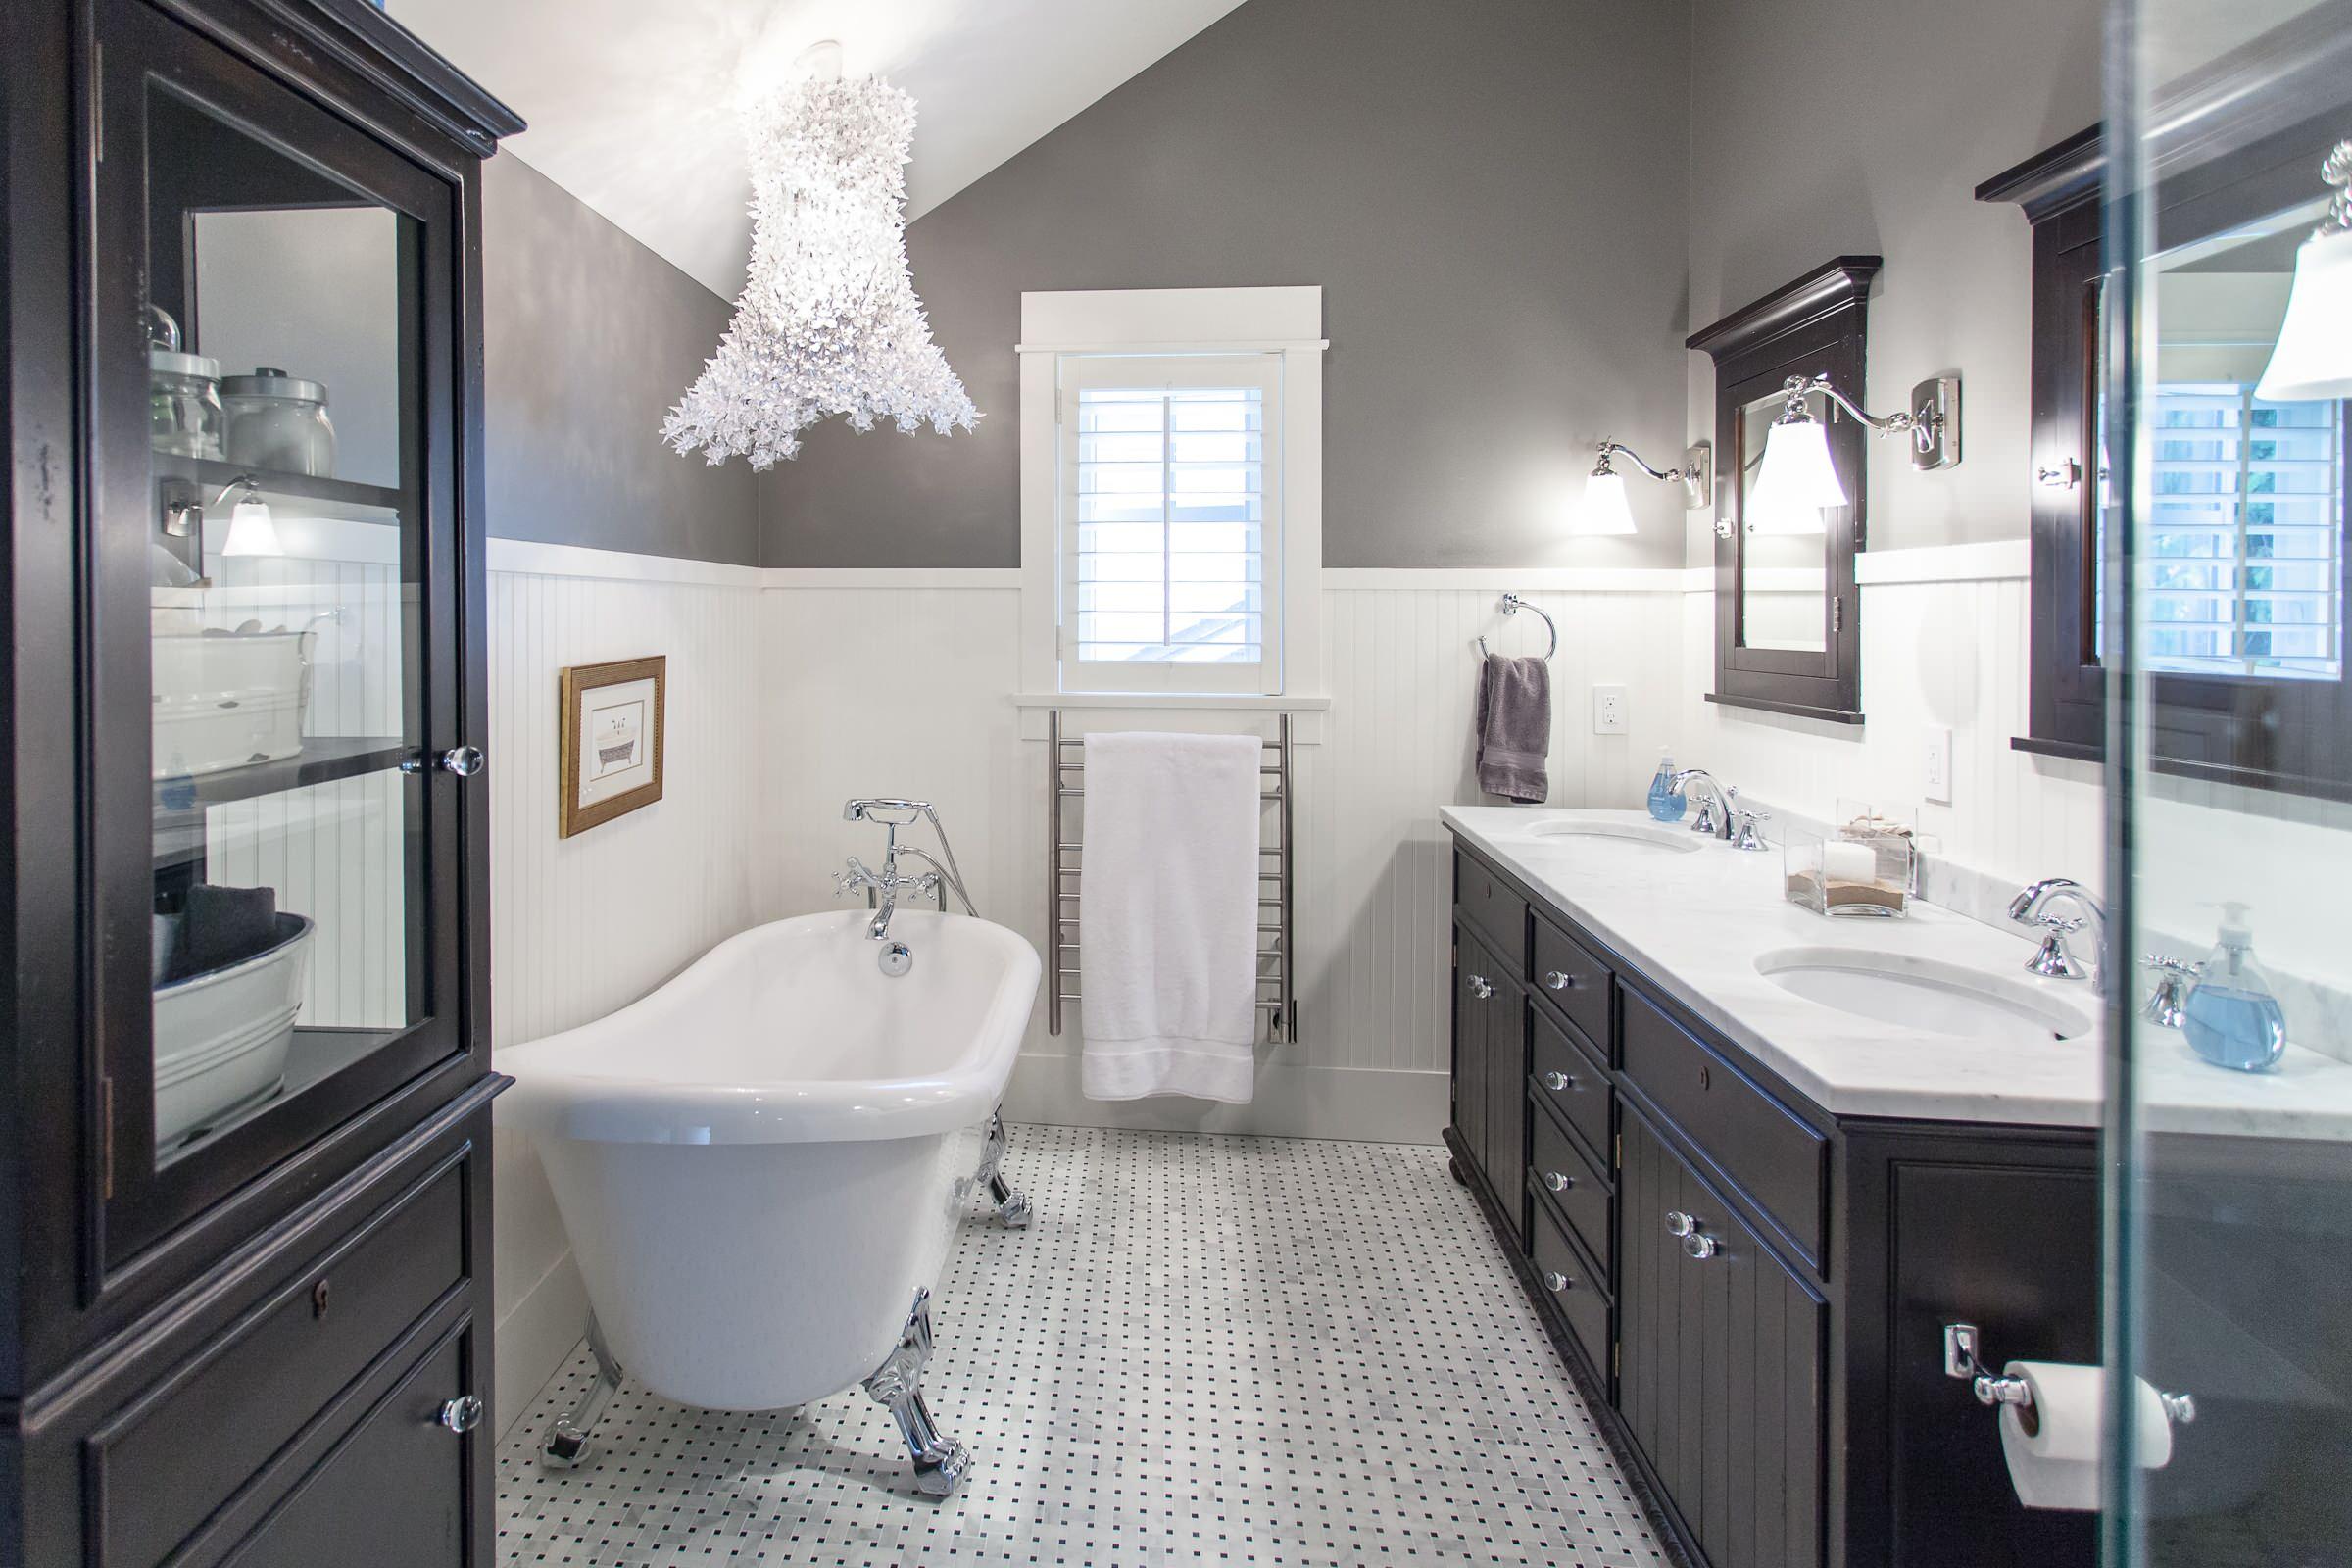 Luxury Bathroom Contrast dark and white